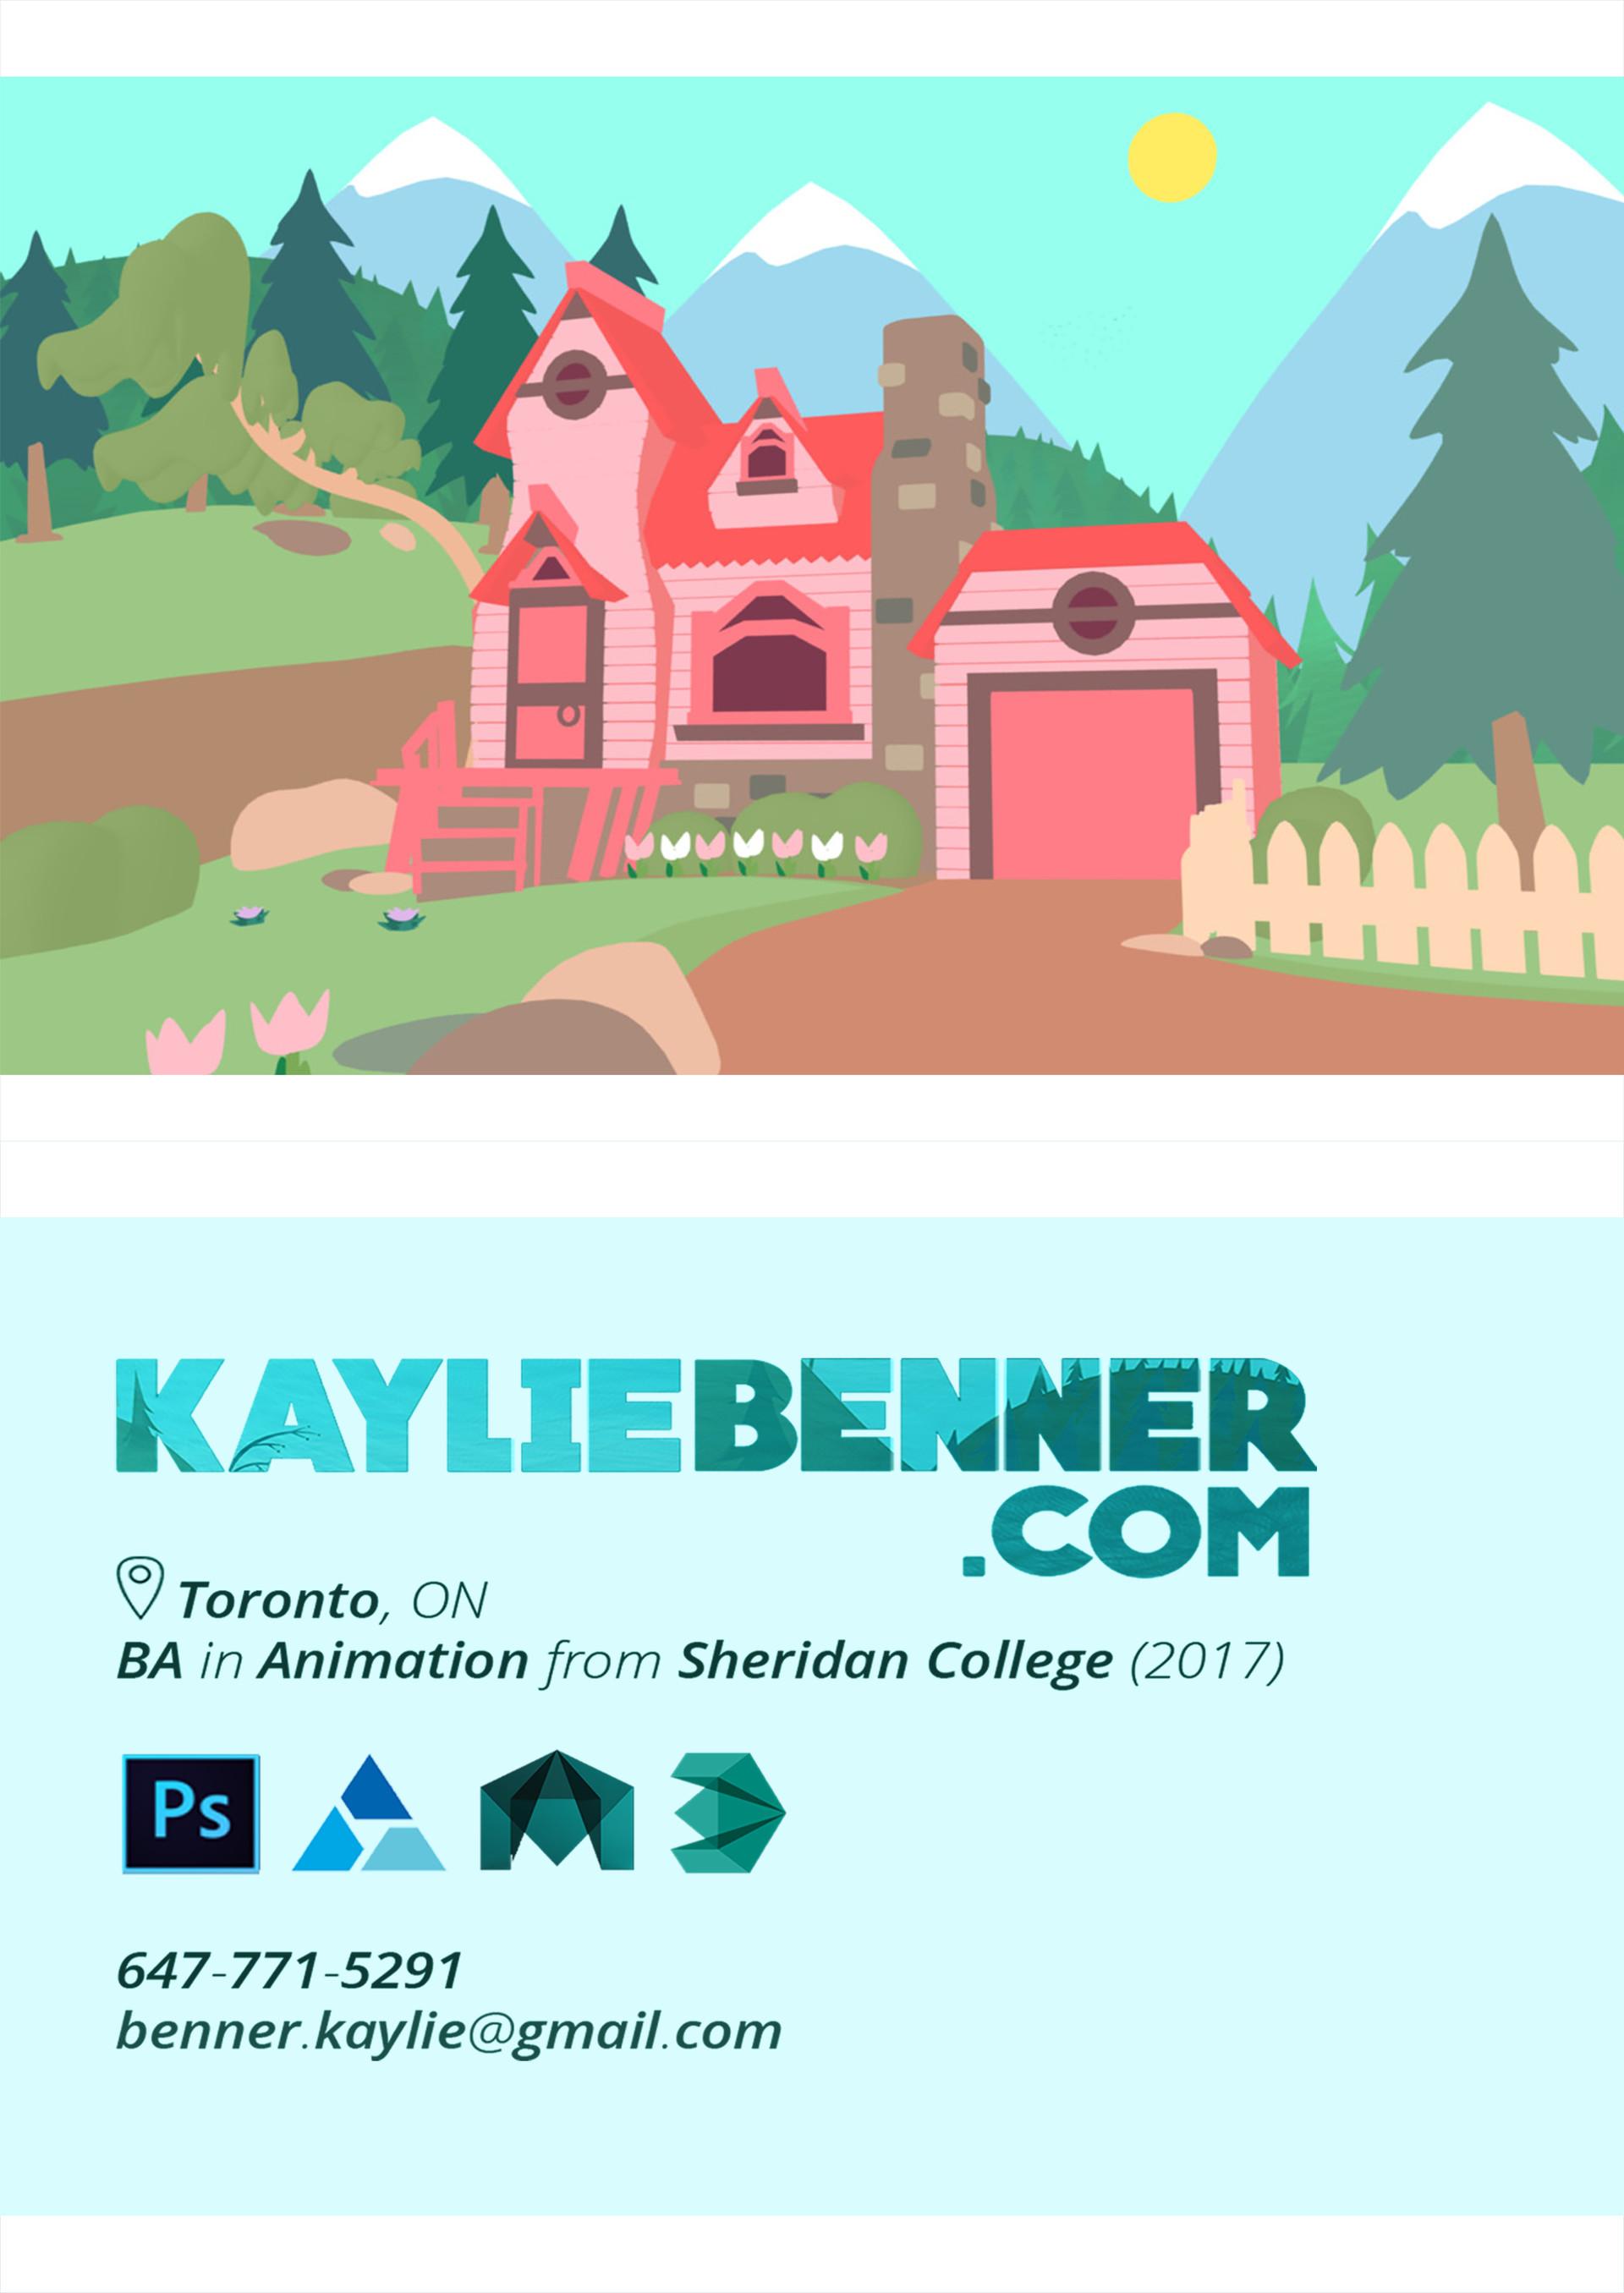 Kaylie benner postcard2